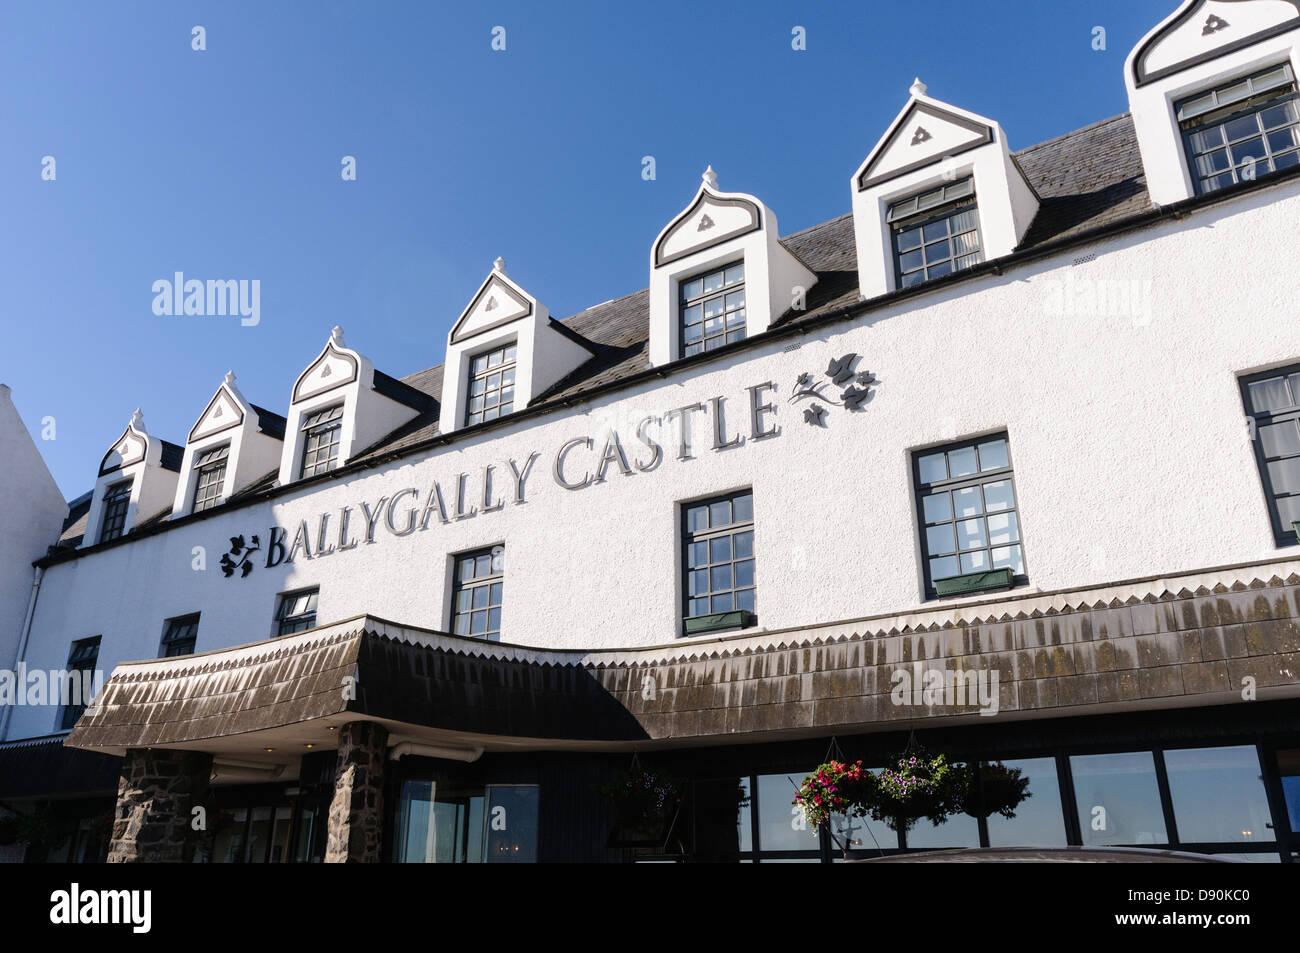 Ballygally Castle Hotel Larne Teil Des Arbeitskreises Hastings